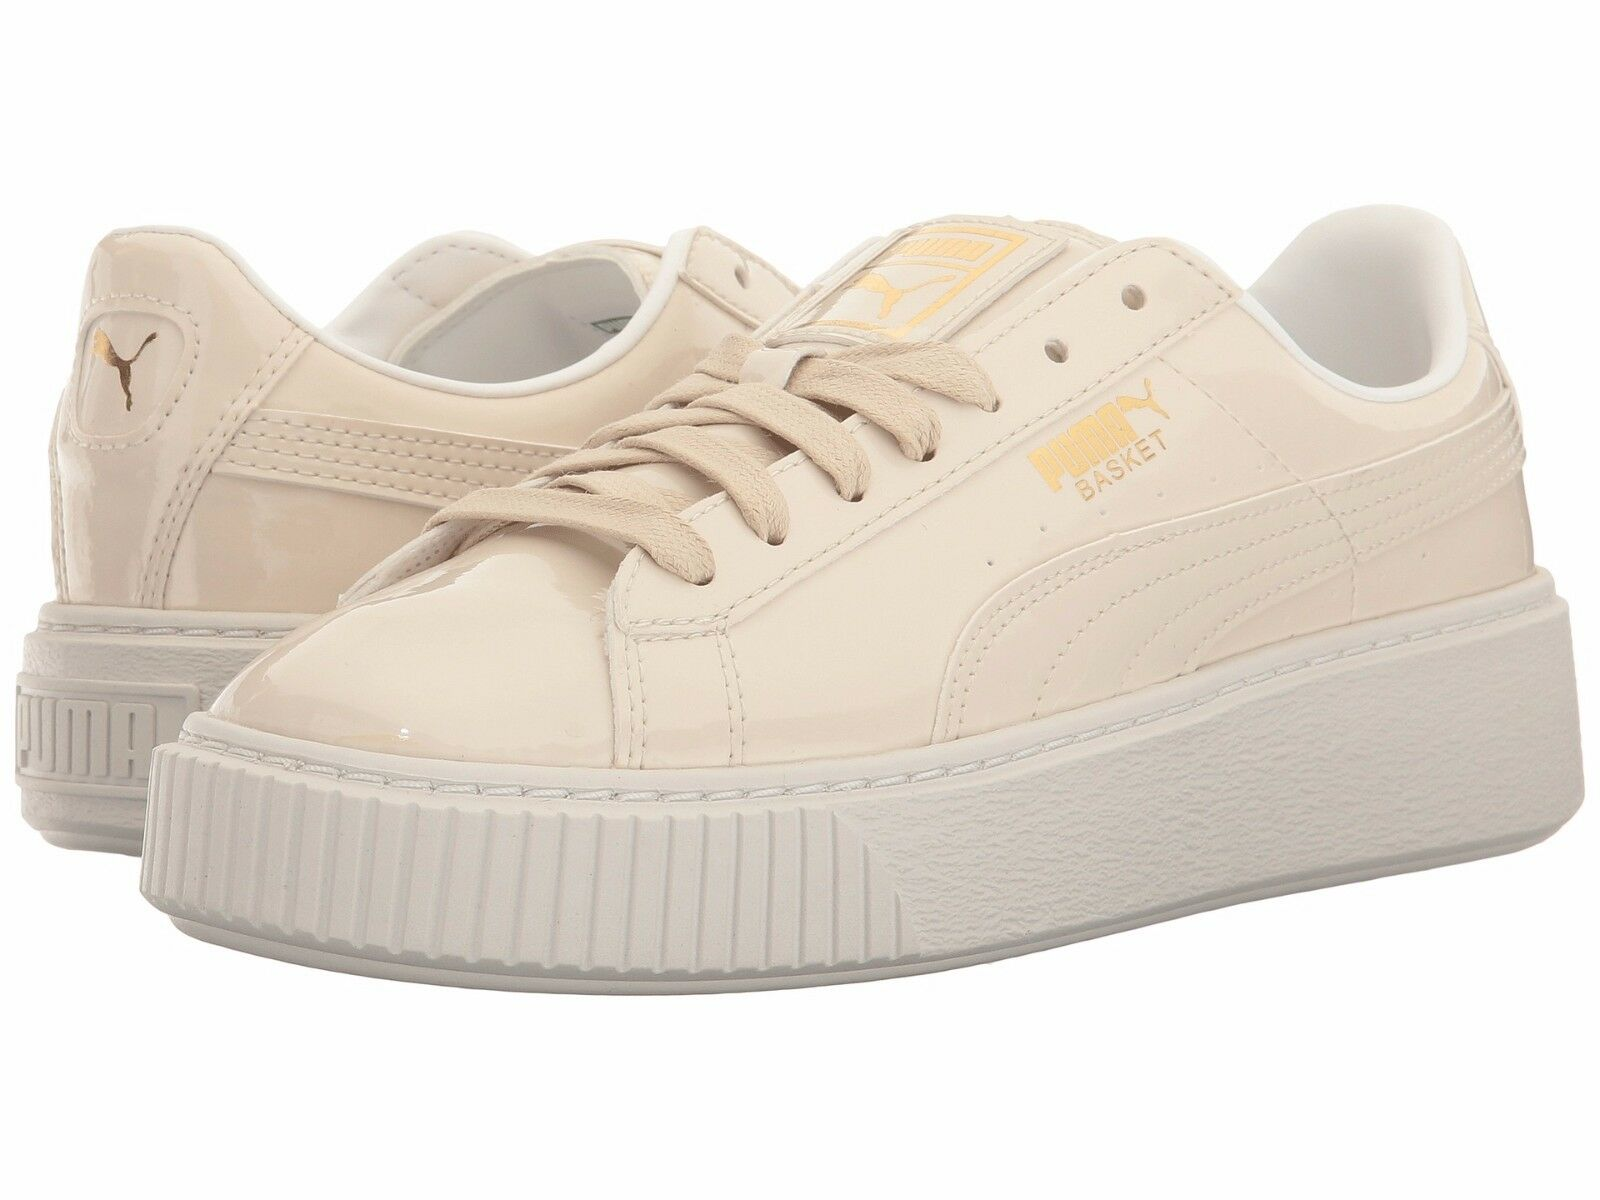 new products 58251 45ed7 Women's Shoe PUMA Basket Platform Patent Leather Sneaker 363314-02 Oatmeal  New*